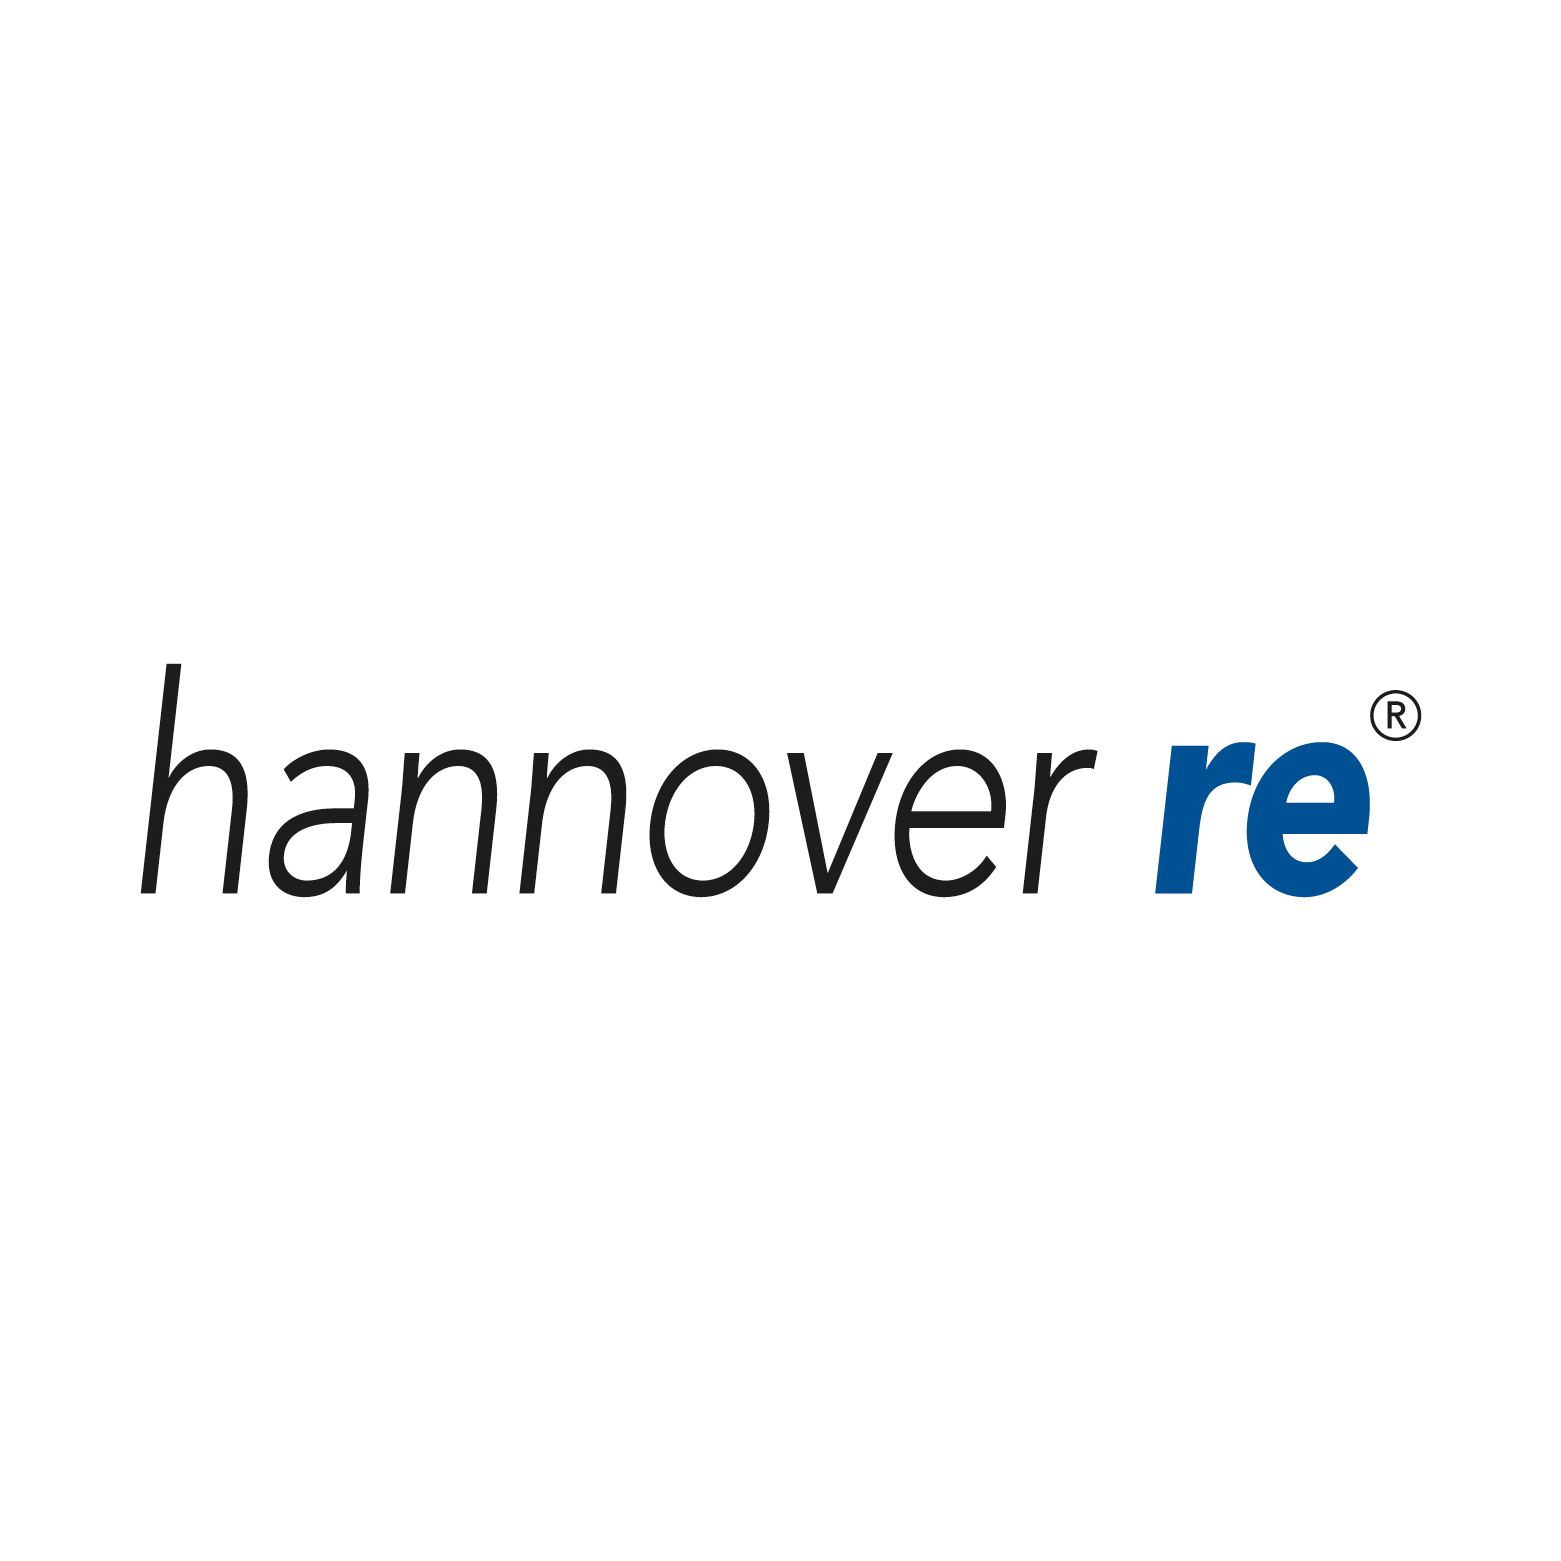 Hannover_re_20140305.jpg